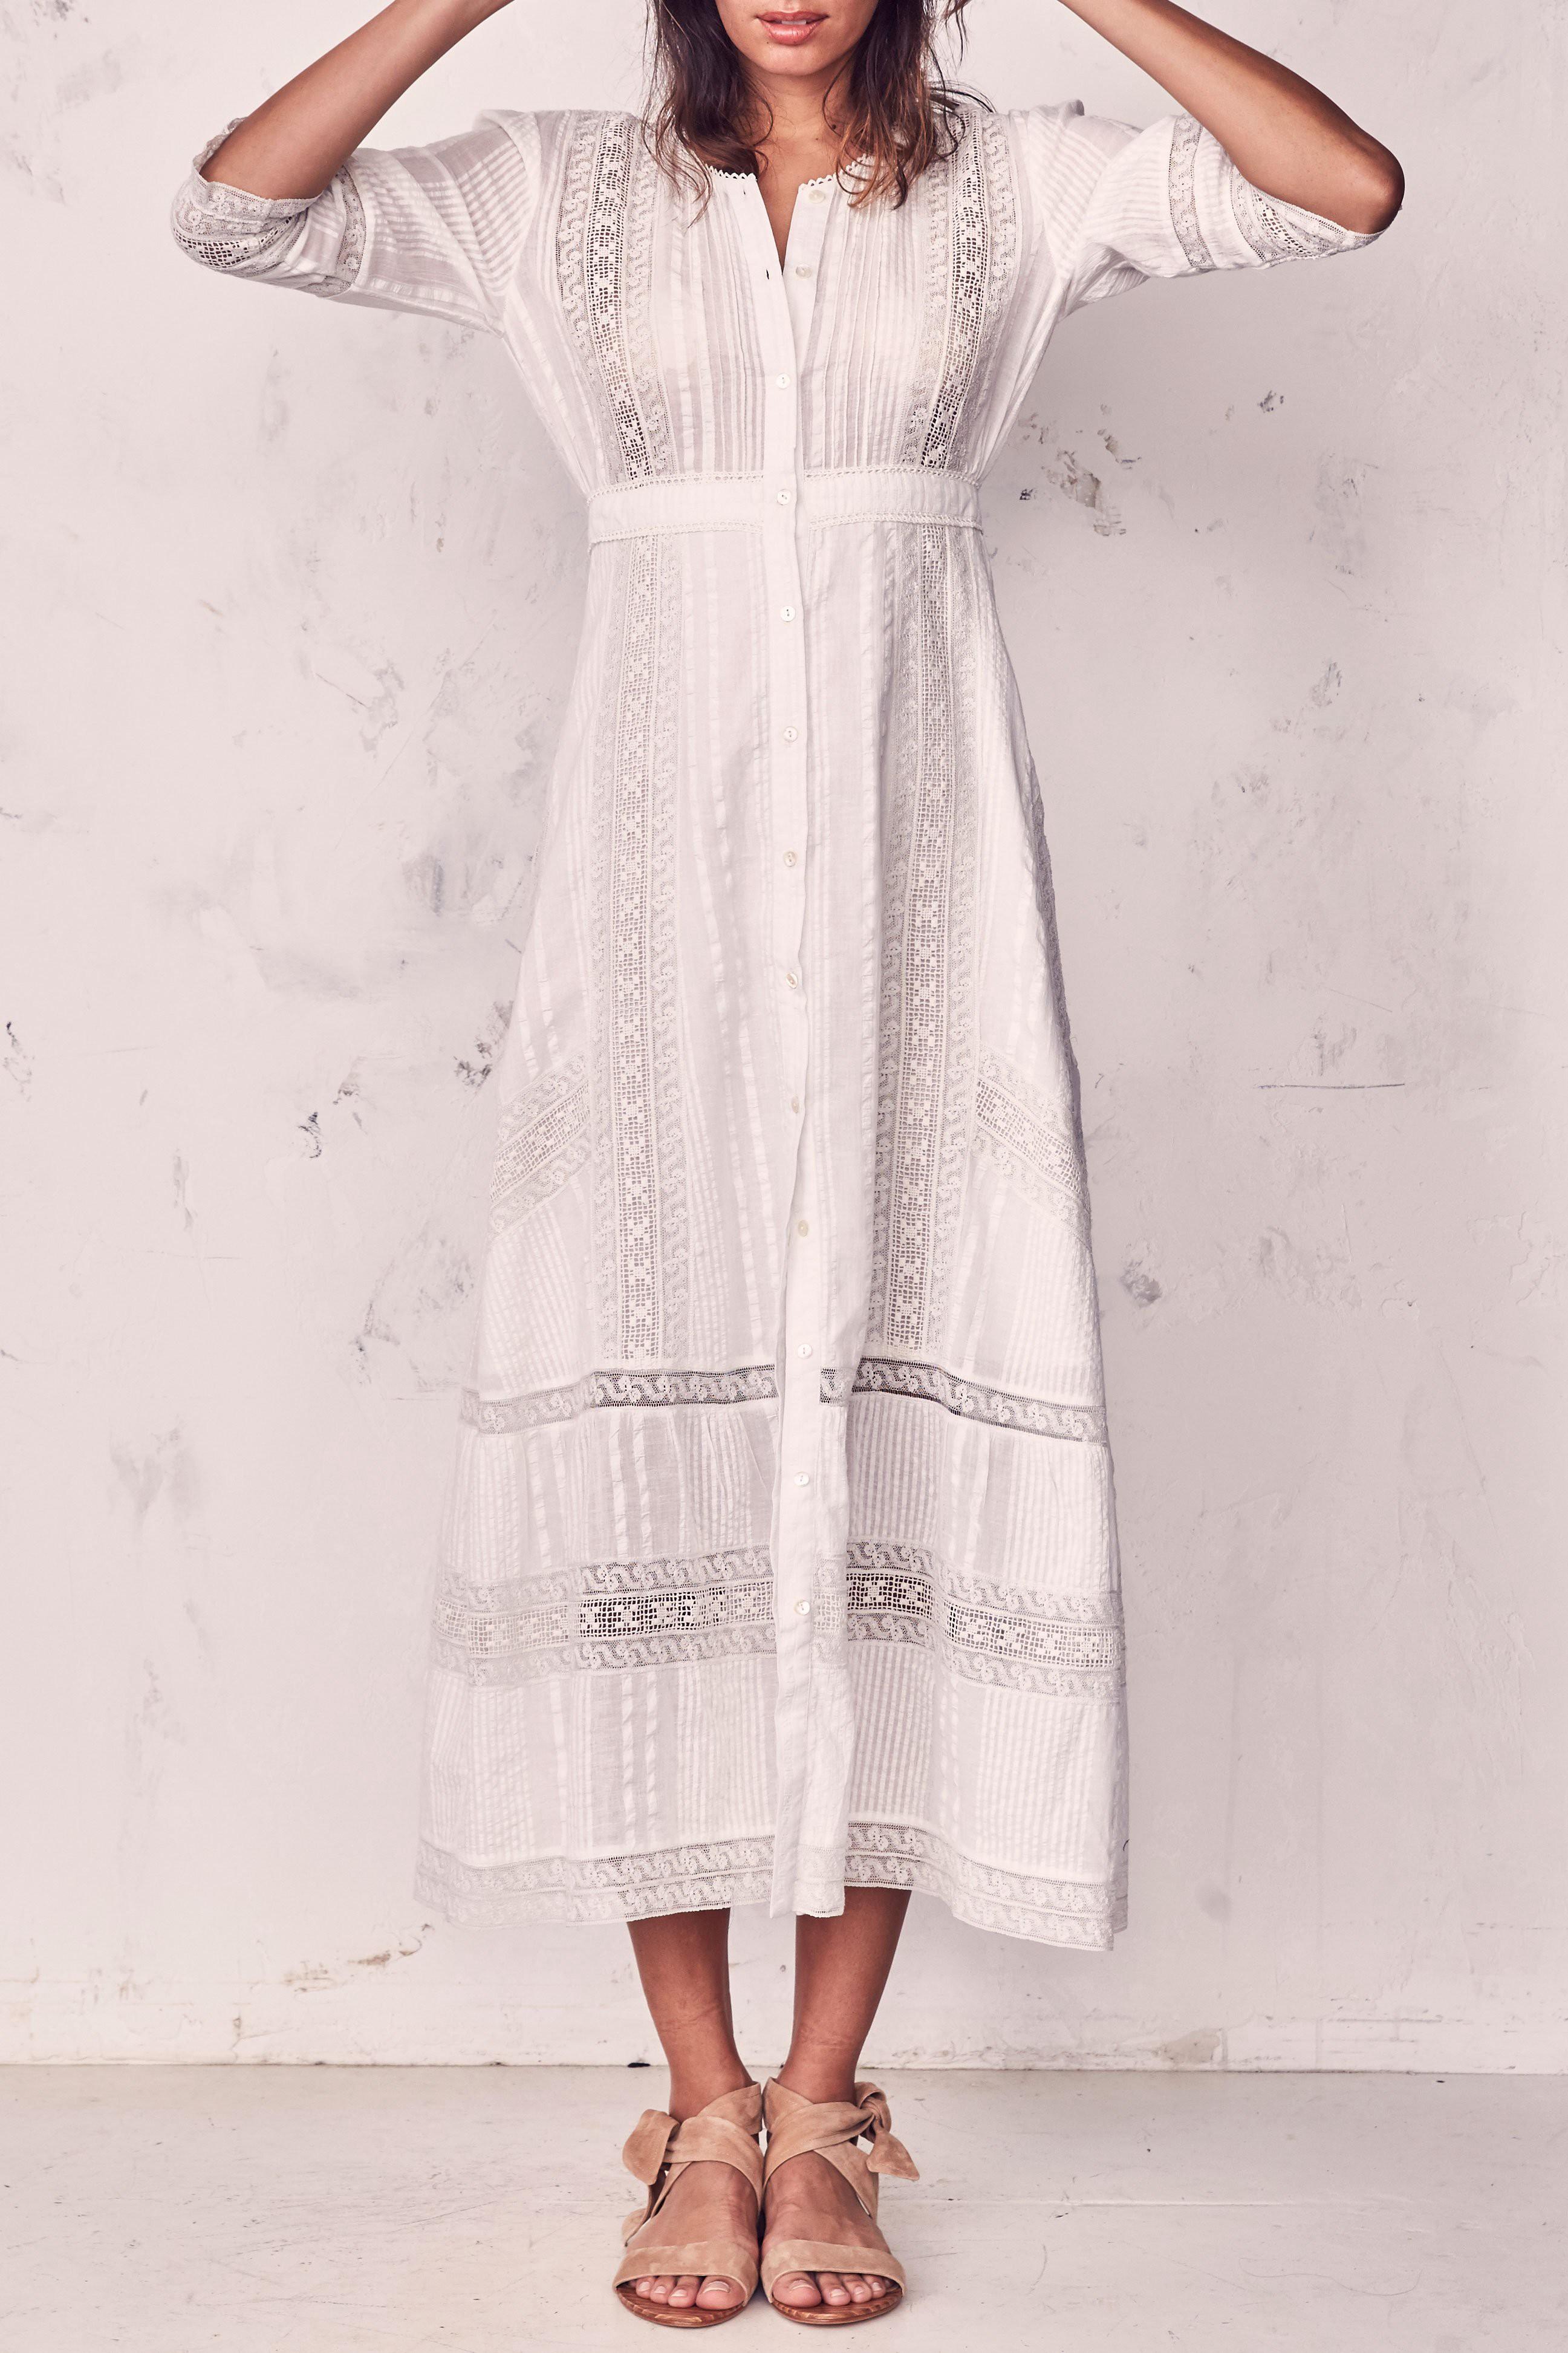 Loveshackfancy Desert Victorian Maxi Dress 6 Casual Dresses For Women Dresses Womens Dresses [ 3891 x 2593 Pixel ]